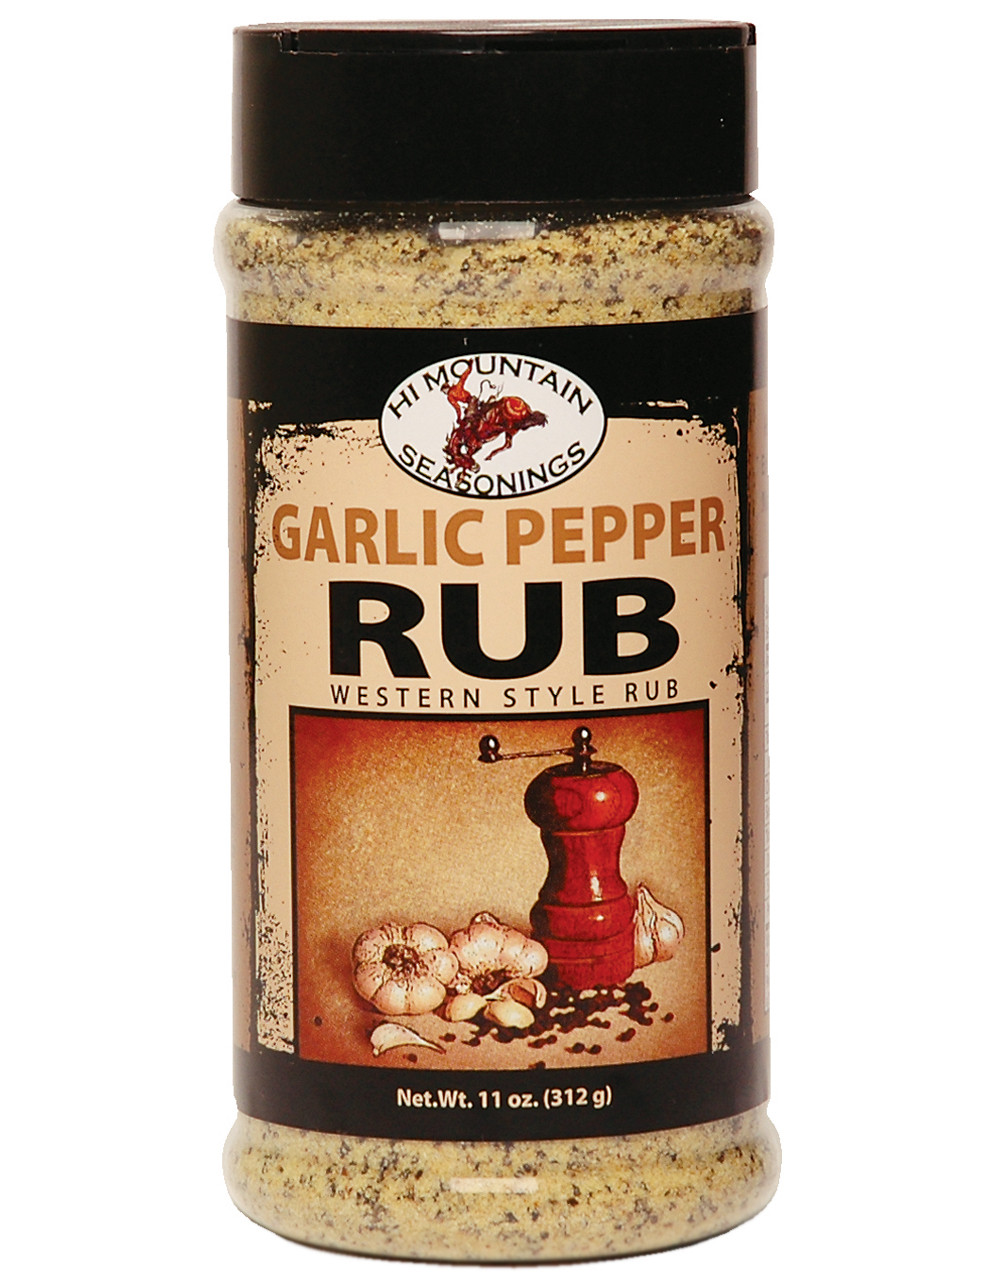 Garlic Pepper Rub Blend